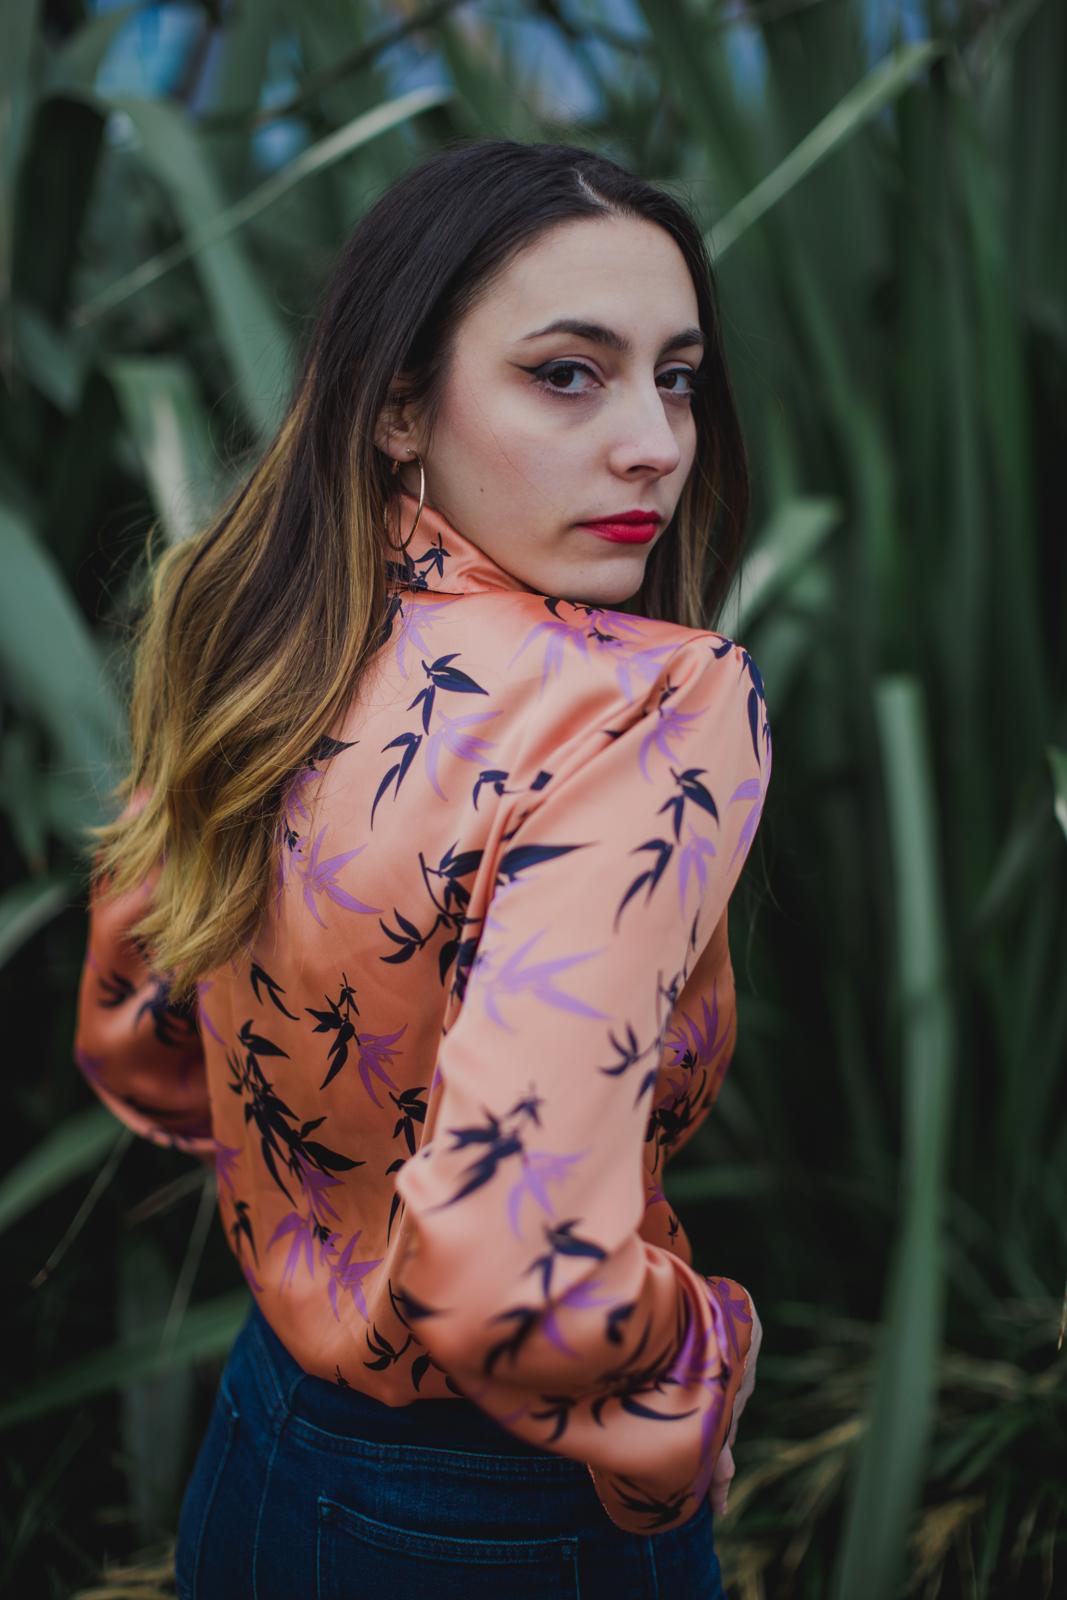 fashion-photographer-london-fashionstory-jasmina-haskovic-minas-planet-uk14.jpg